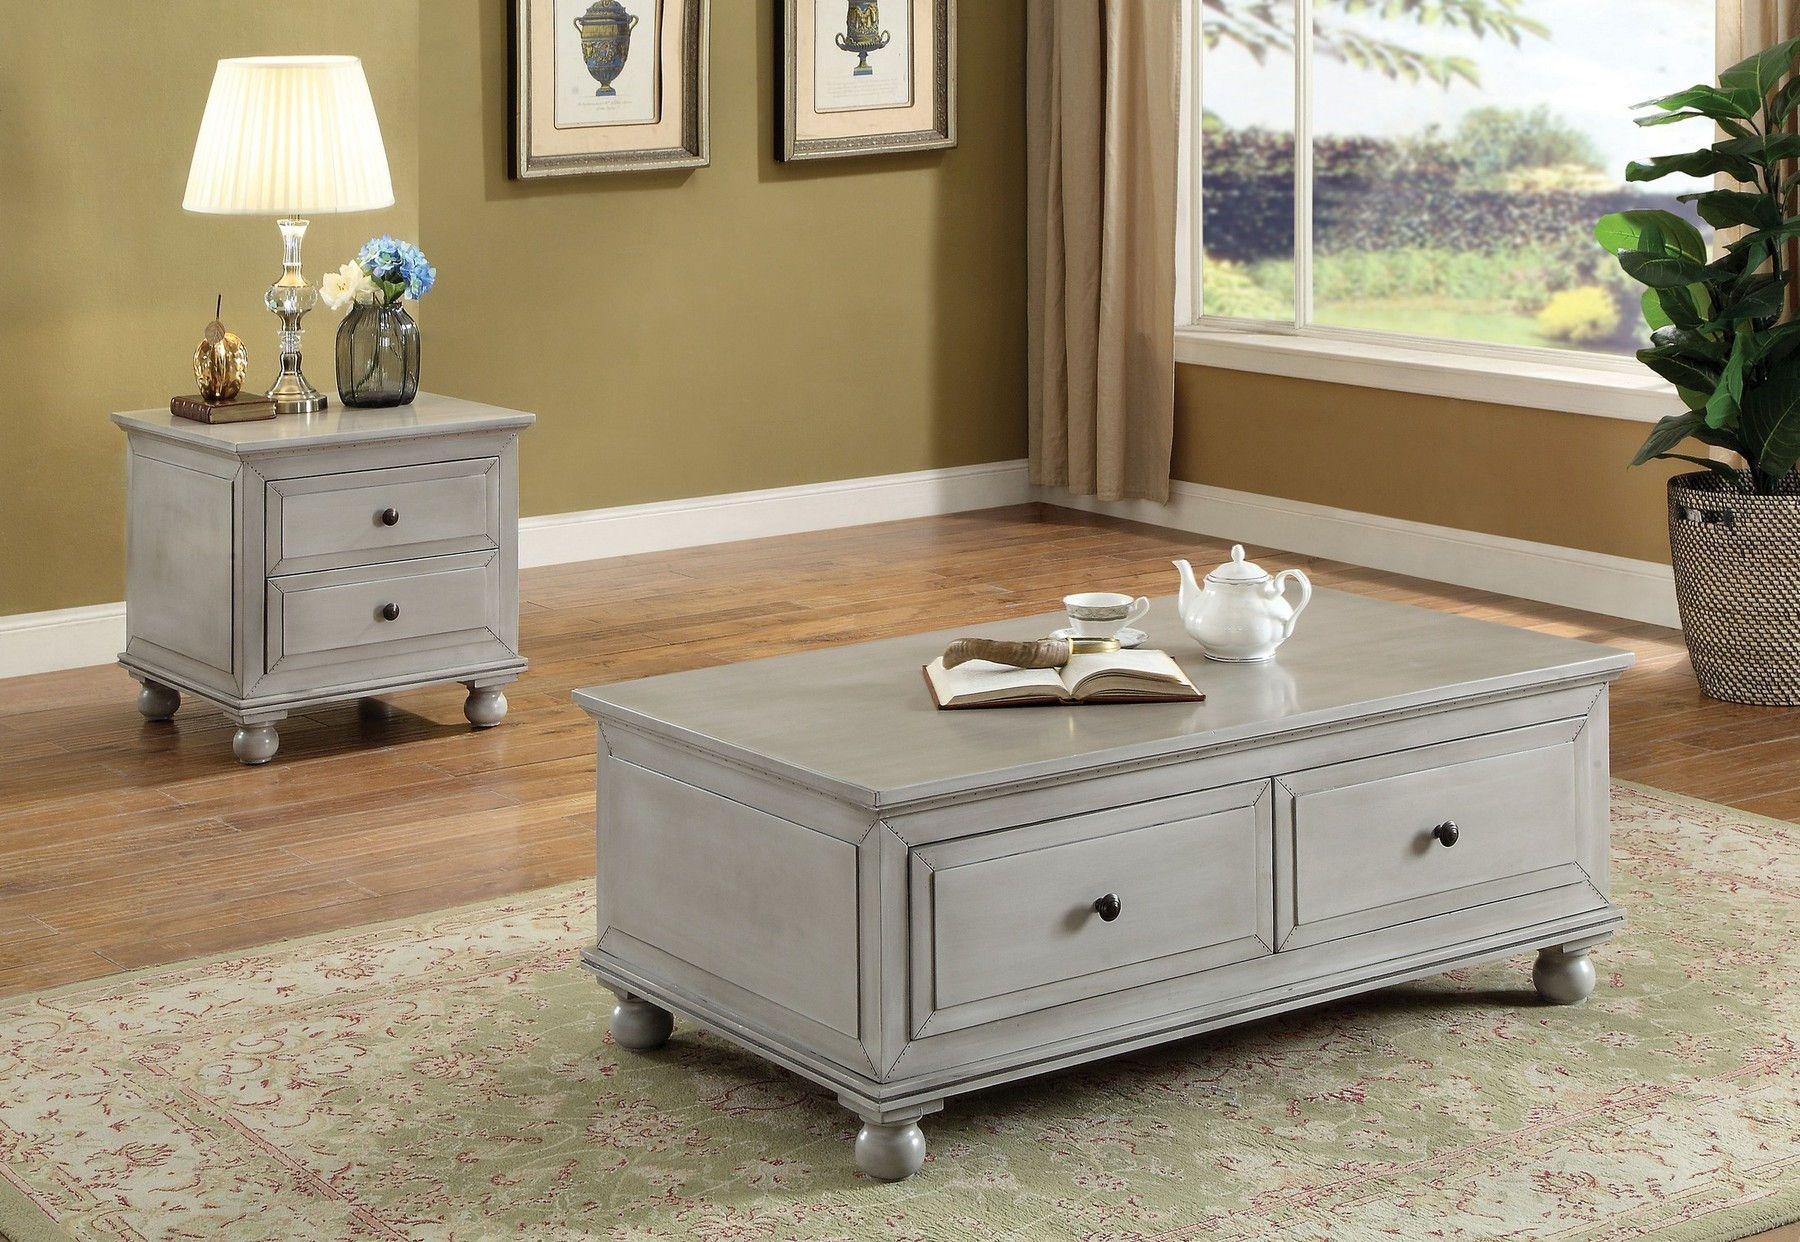 Acme corporation vidar antique gray finish coffee table w